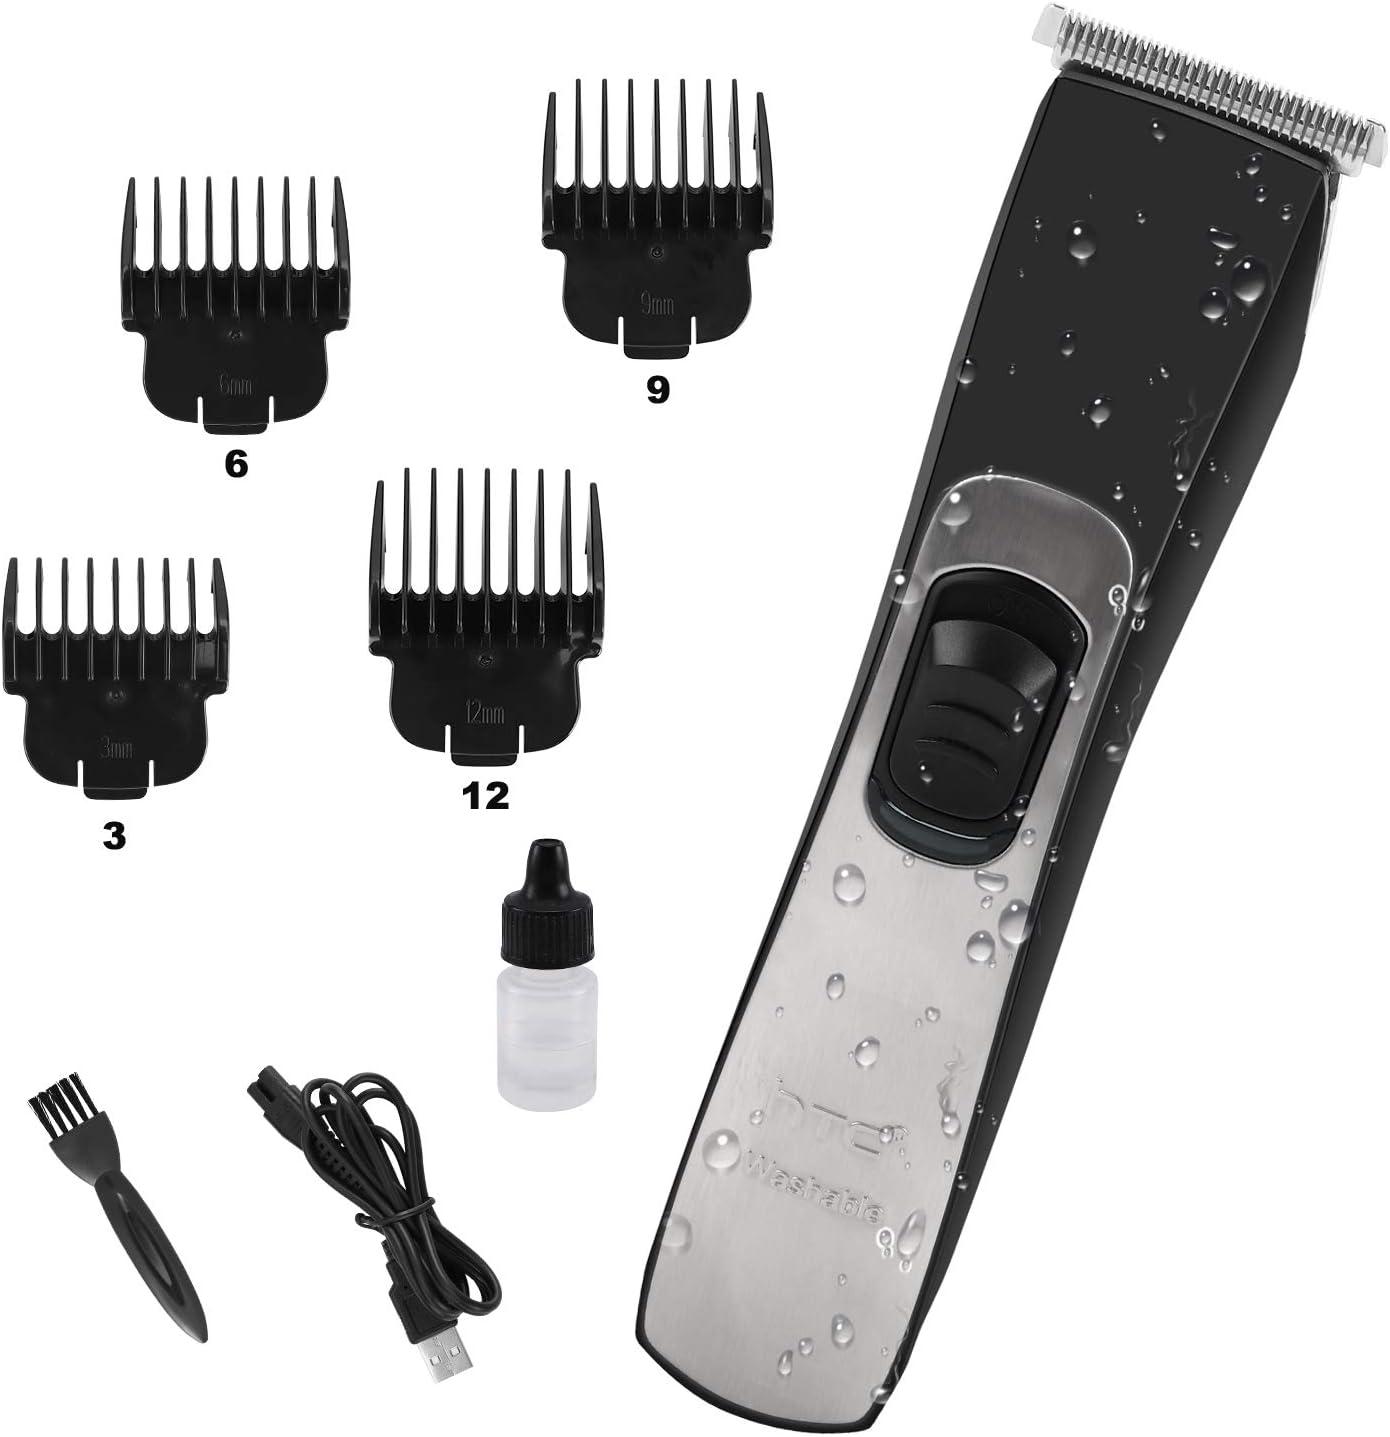 Máquina Cortar Pelo Profesional Cortapelos Hombre Recortadora Barba y Cortadora de Pelo con 4 Peines Guía (IPX7 Impermeable & USB Carga Rápida)